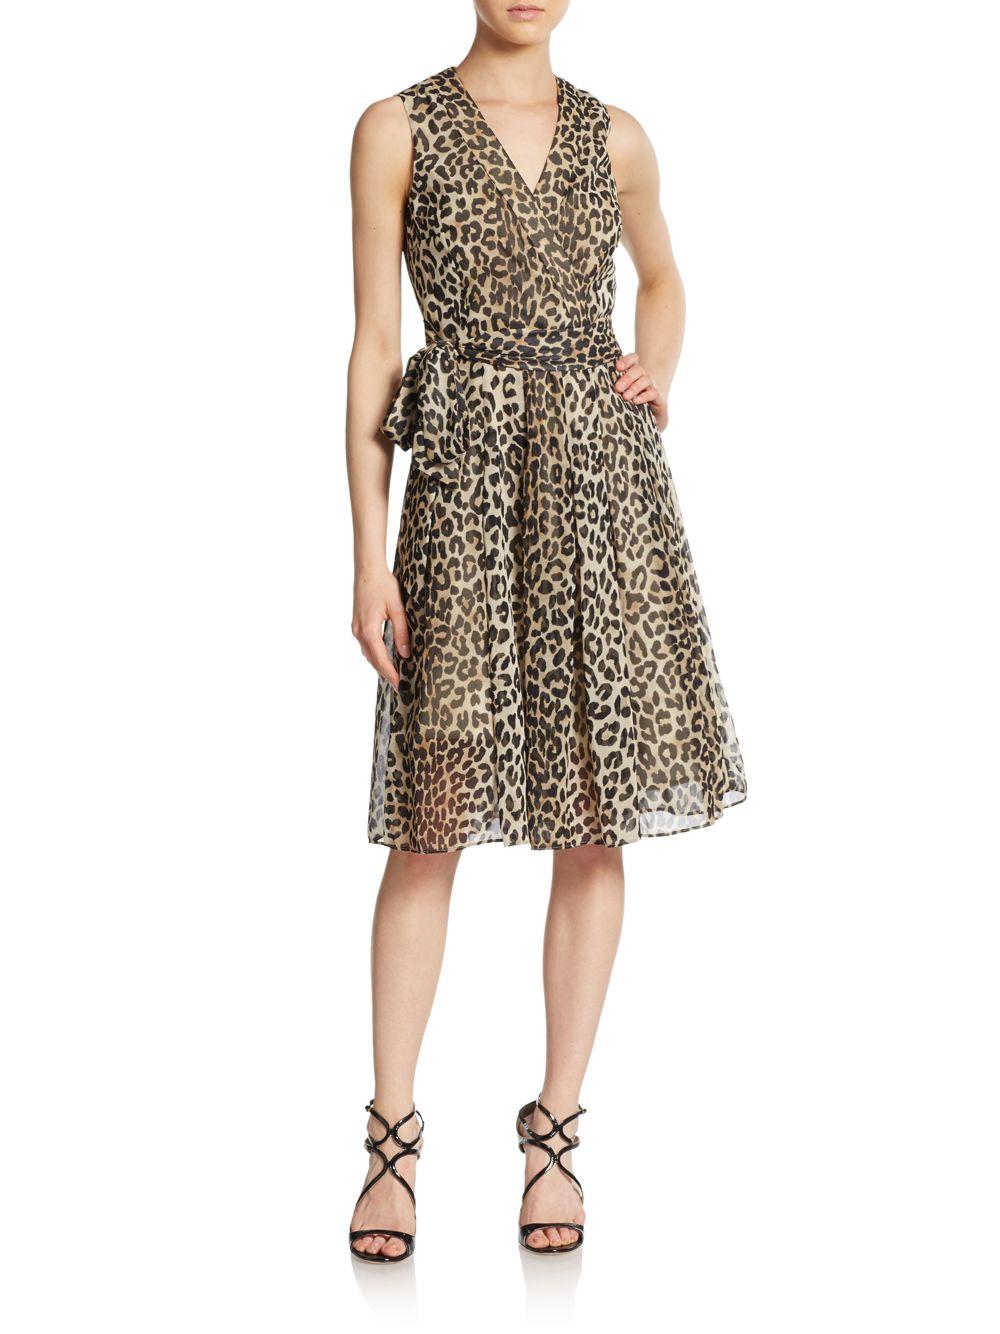 Lyst Anne Klein Leopard Print Chiffon Fit And Flare Dress